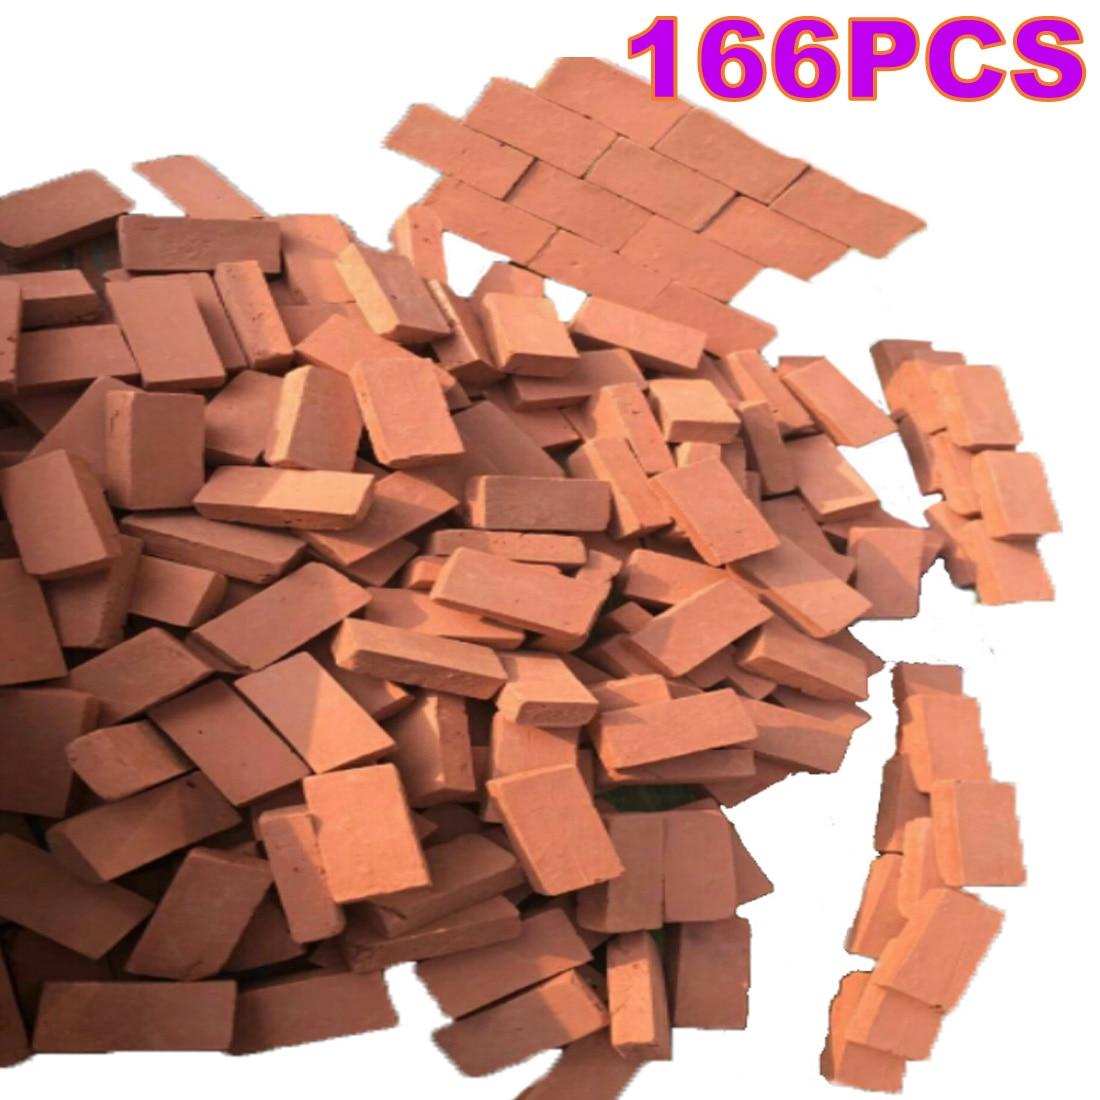 ALI shop ...  ... 4000170809075 ... 1 ... 166Pcs 1:16 Scale Mini Red Bricks Model Antique Micro Landscape Decorative Bricks For DIY Sand Table Building - Orange Red ...